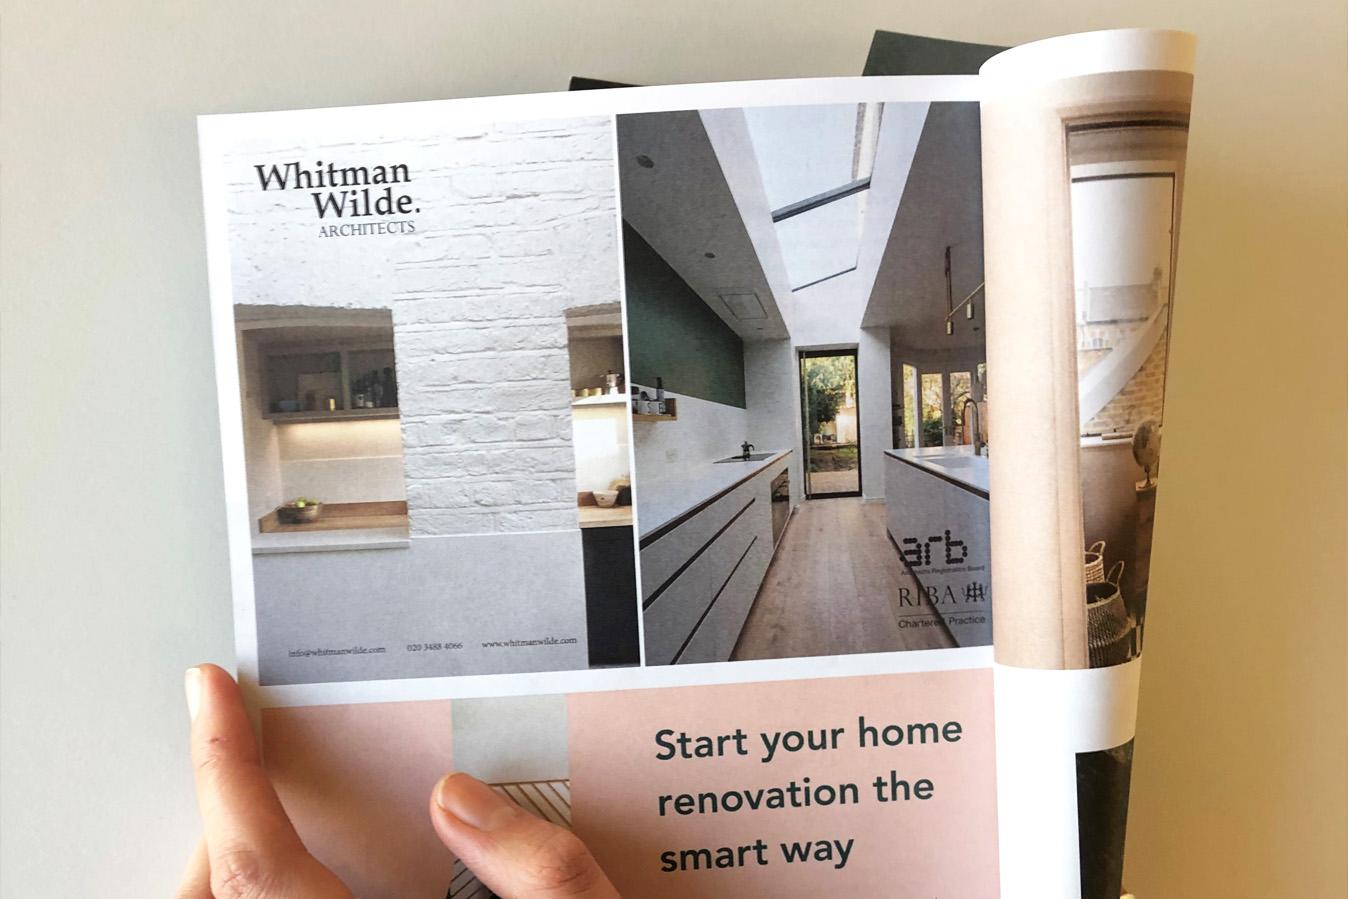 whitman wilde architects.jpg